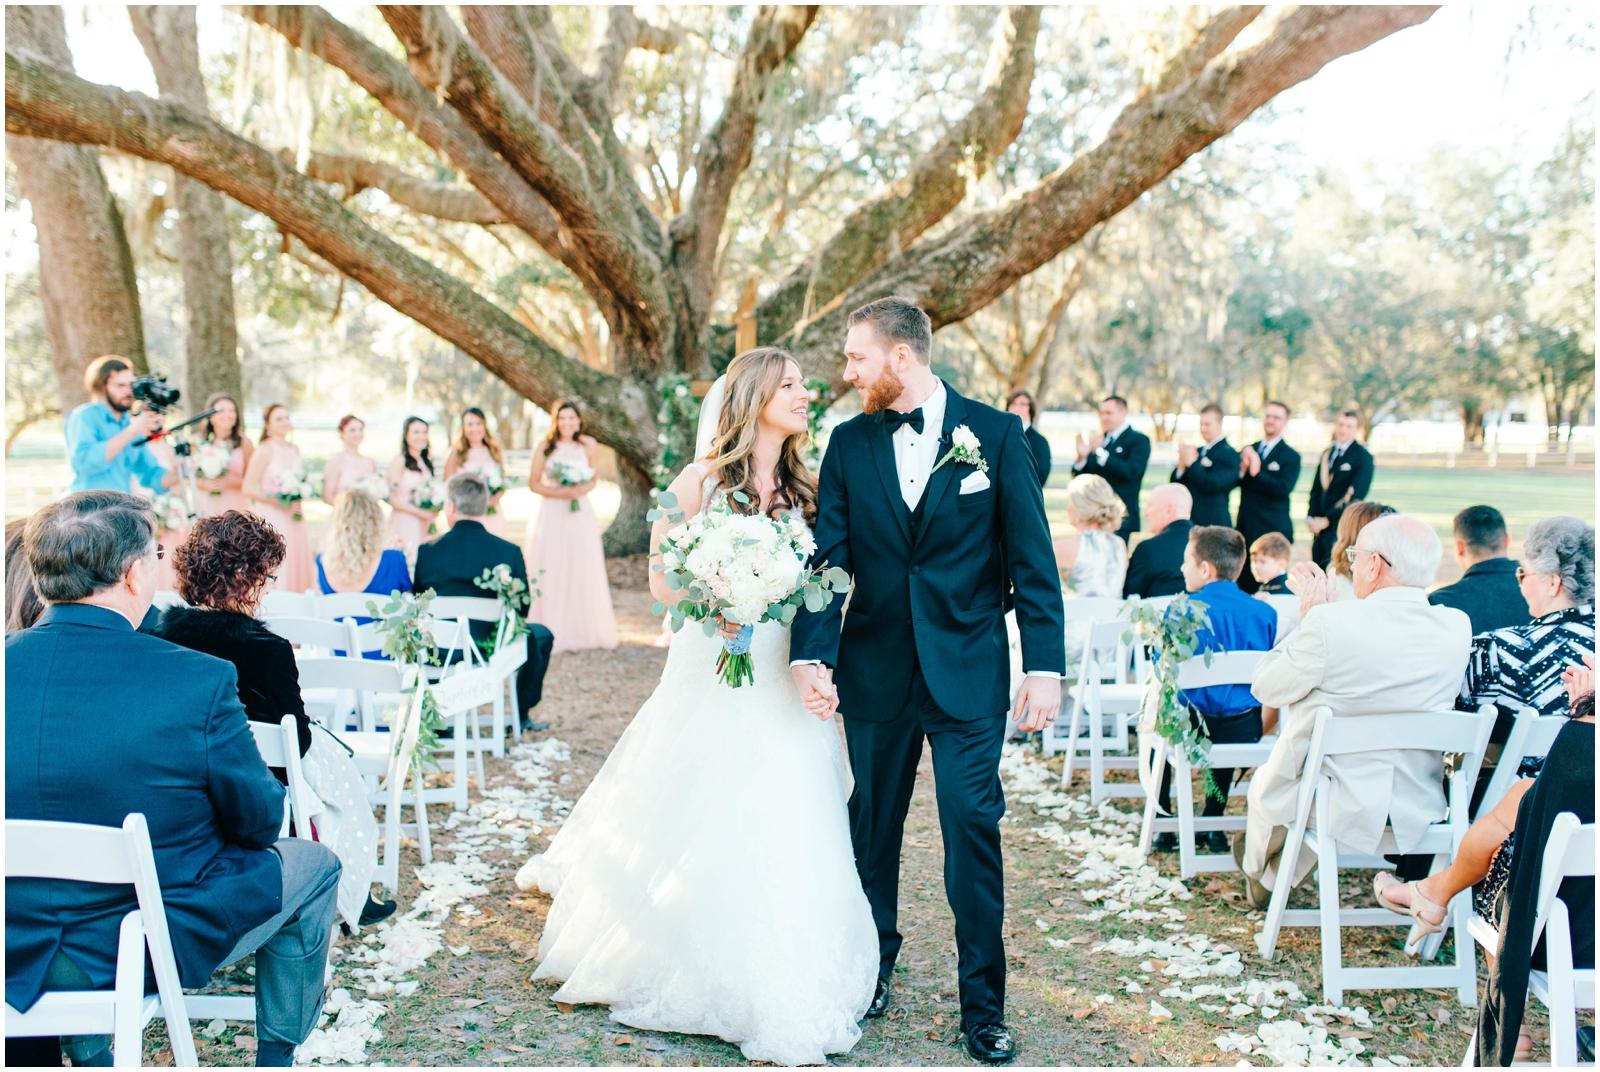 Tampa Area Wedding Venue with Southern Charm- Stonebridge Events_0281.jpg